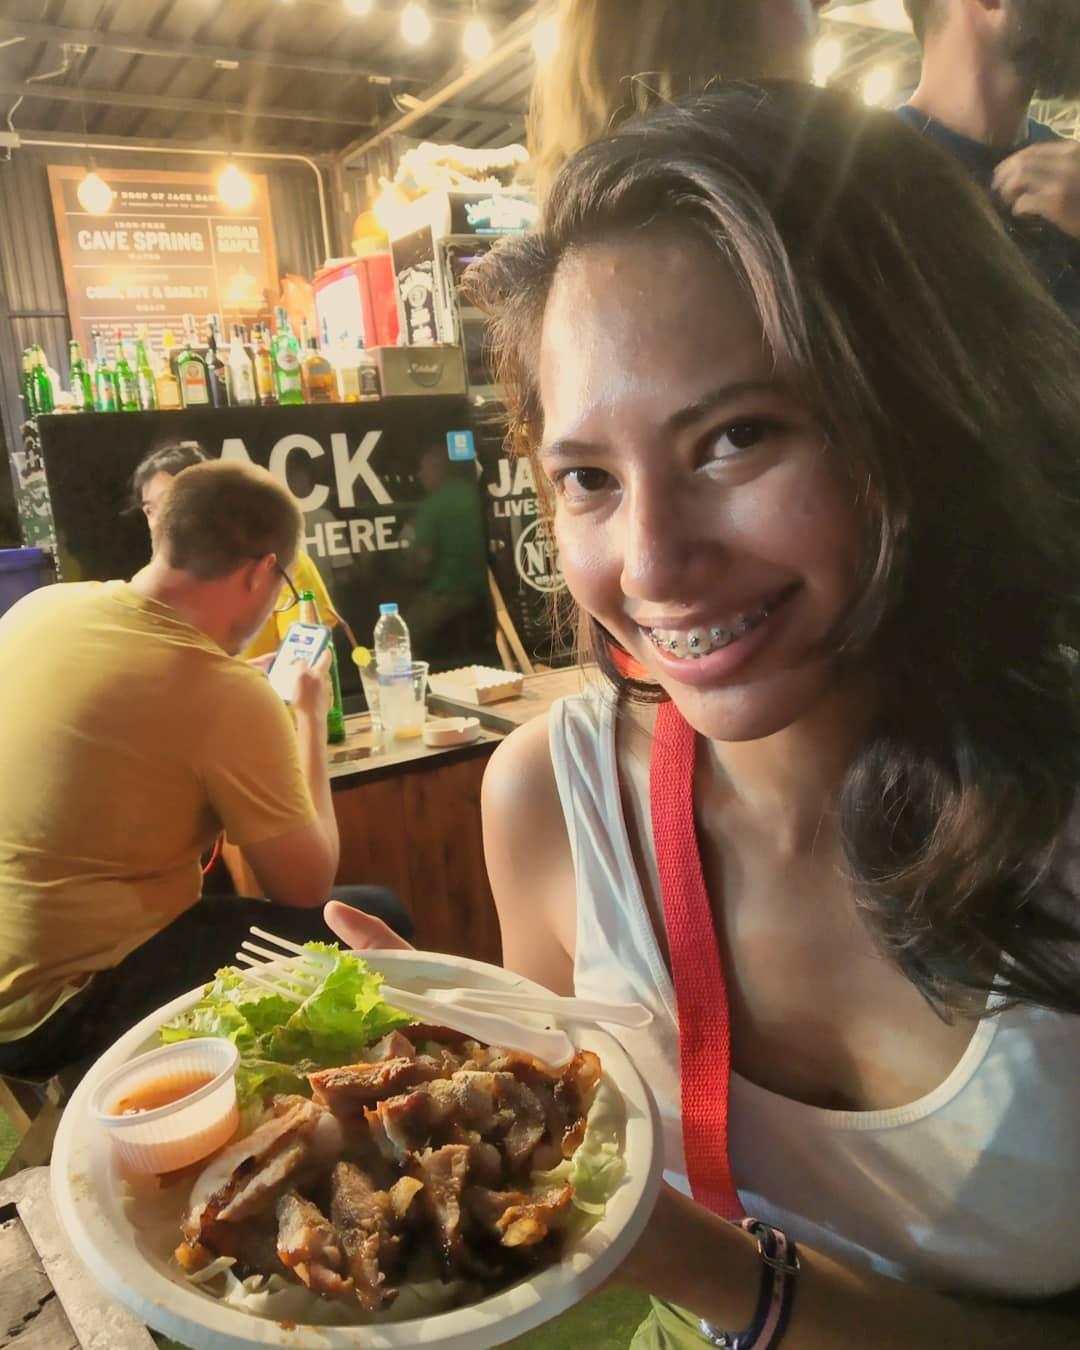 Eating crocodile meat in Thailand - Ummi Goes Where?